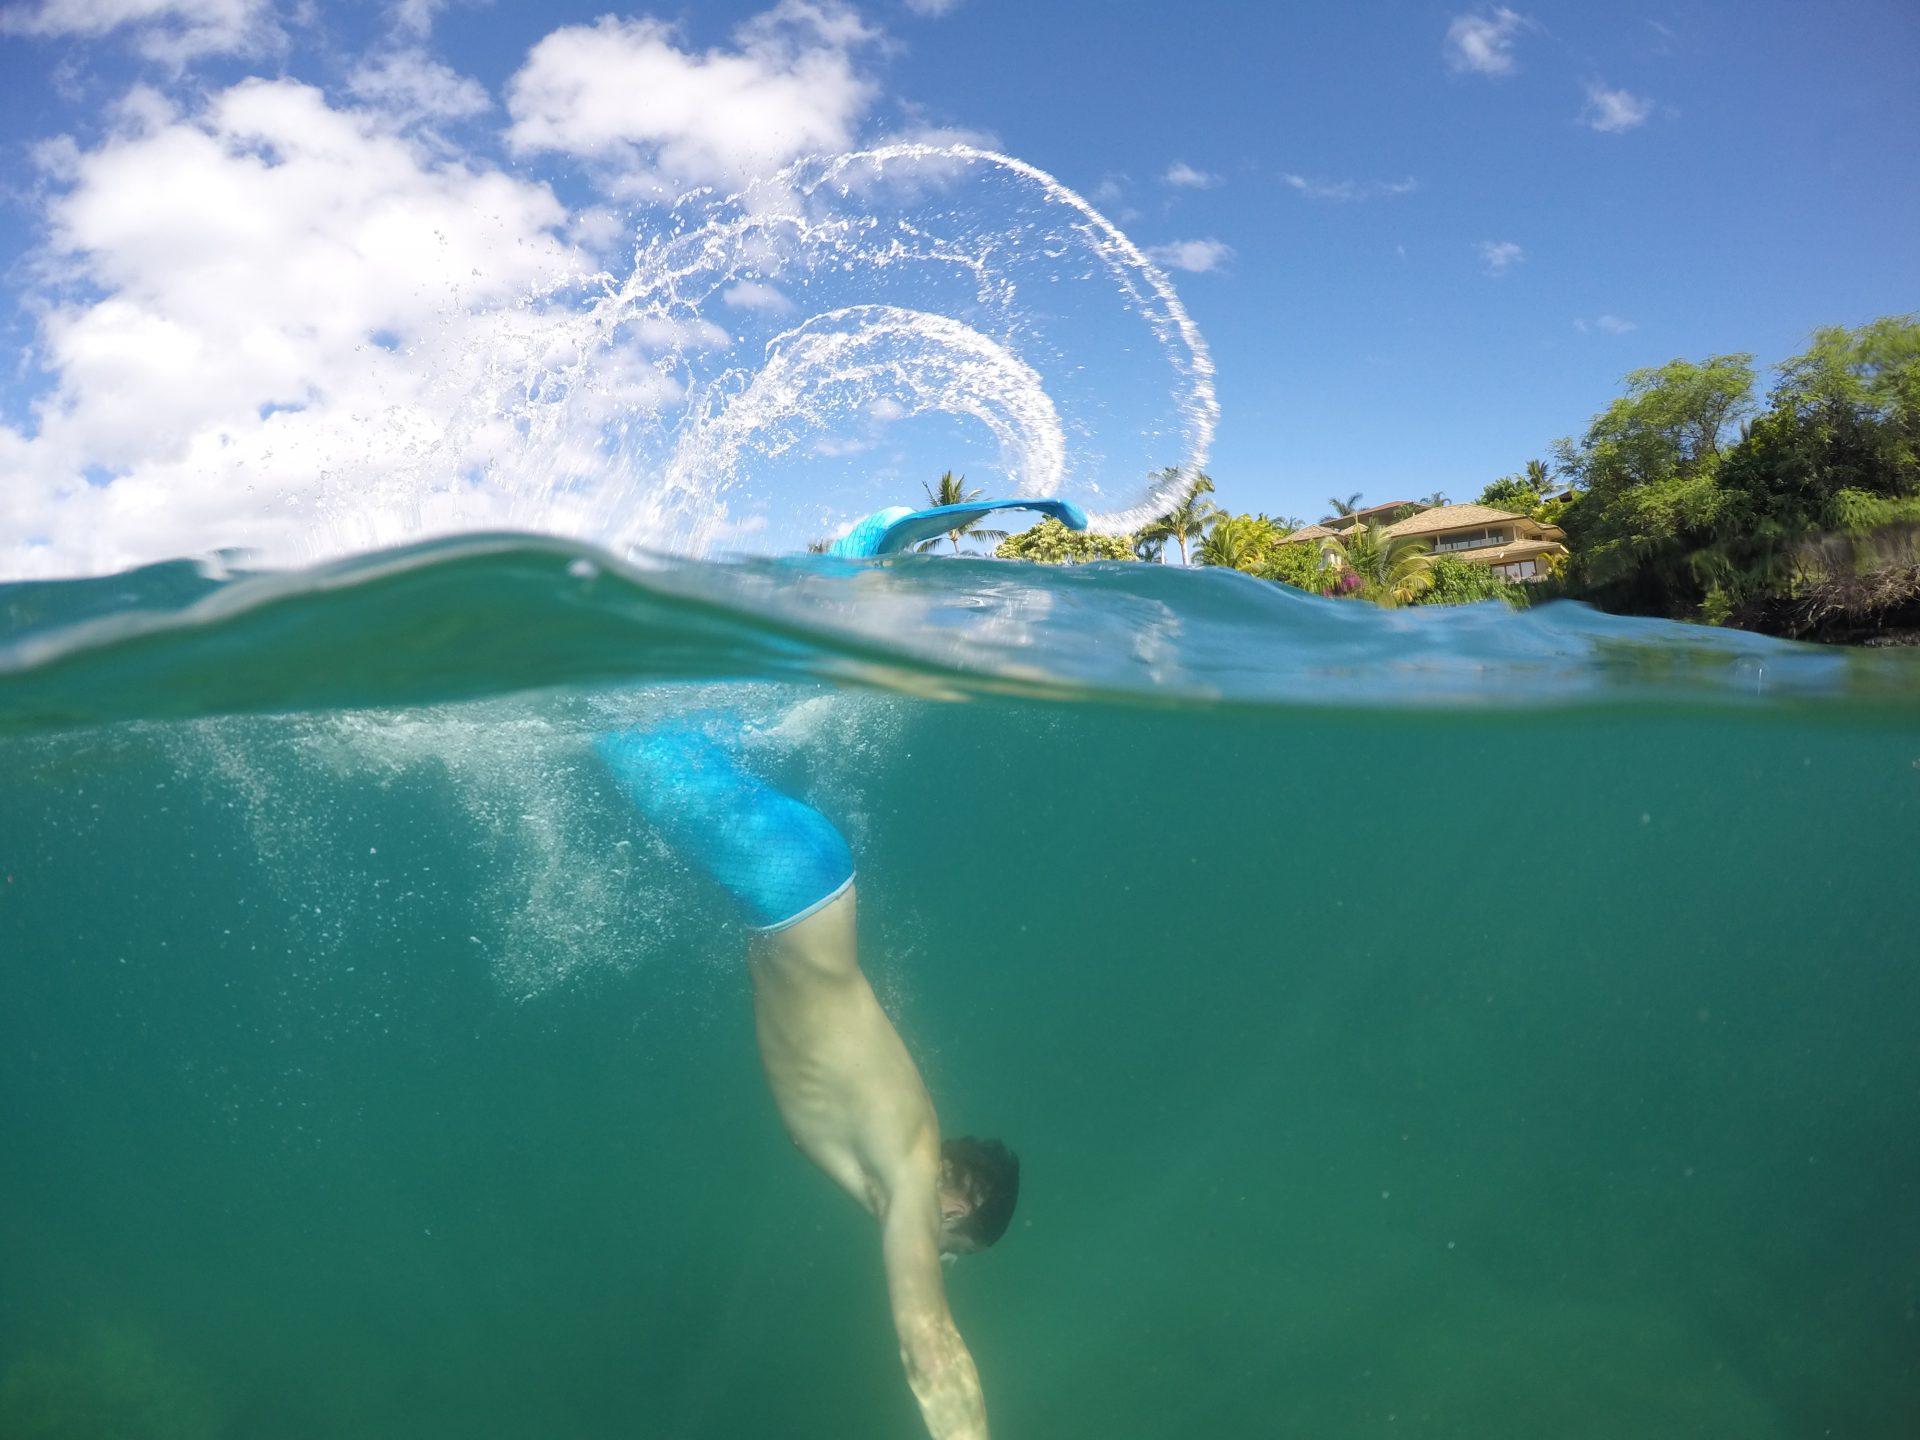 hawaii mermaid adventures swimming e